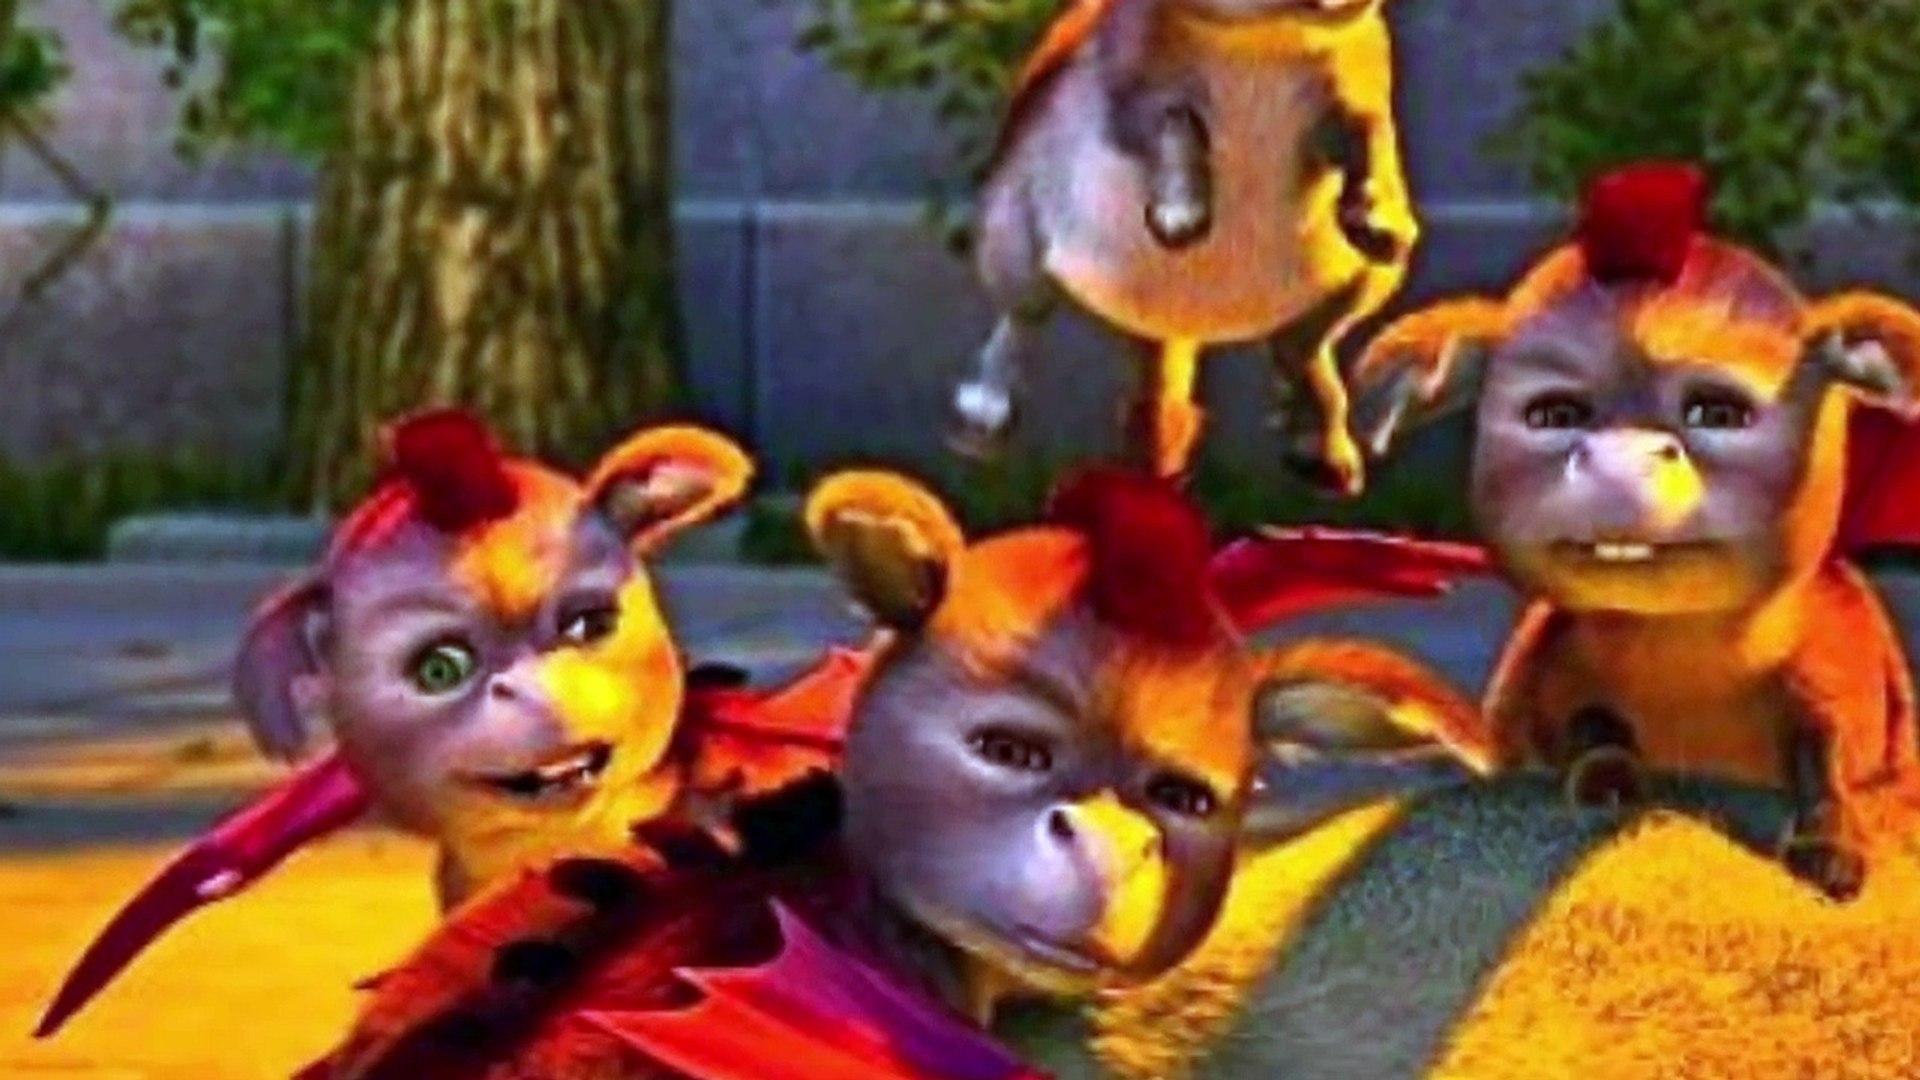 Shrek Theory How Do Donkey And Dragon Have Dronkeys Theory Video Dailymotion